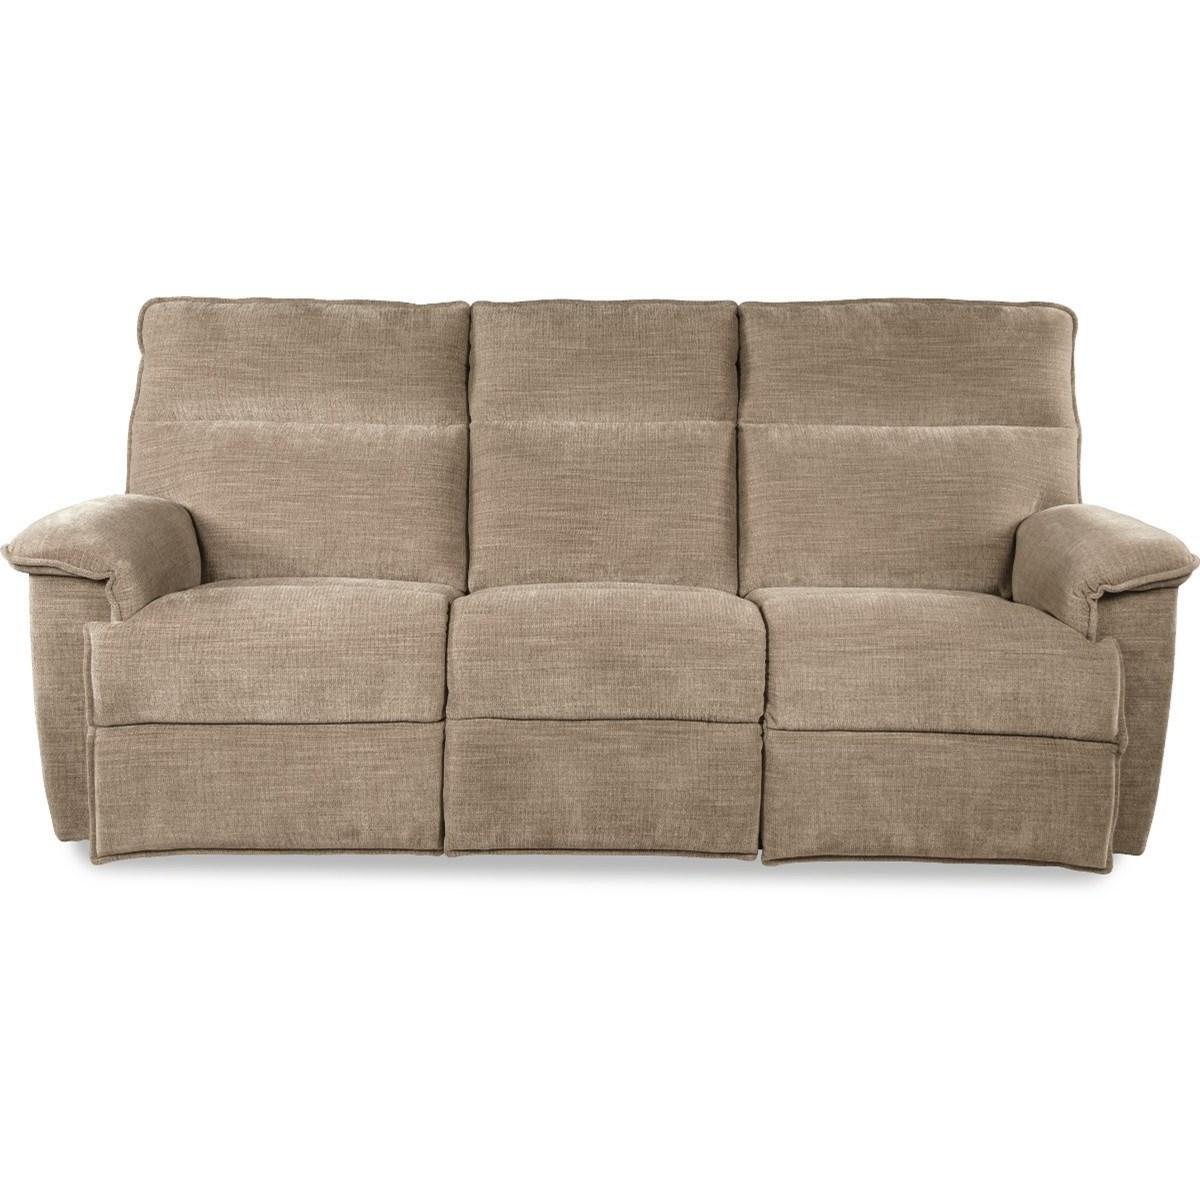 PowerRecline Reclining Sofa w/ Pwr Headrests